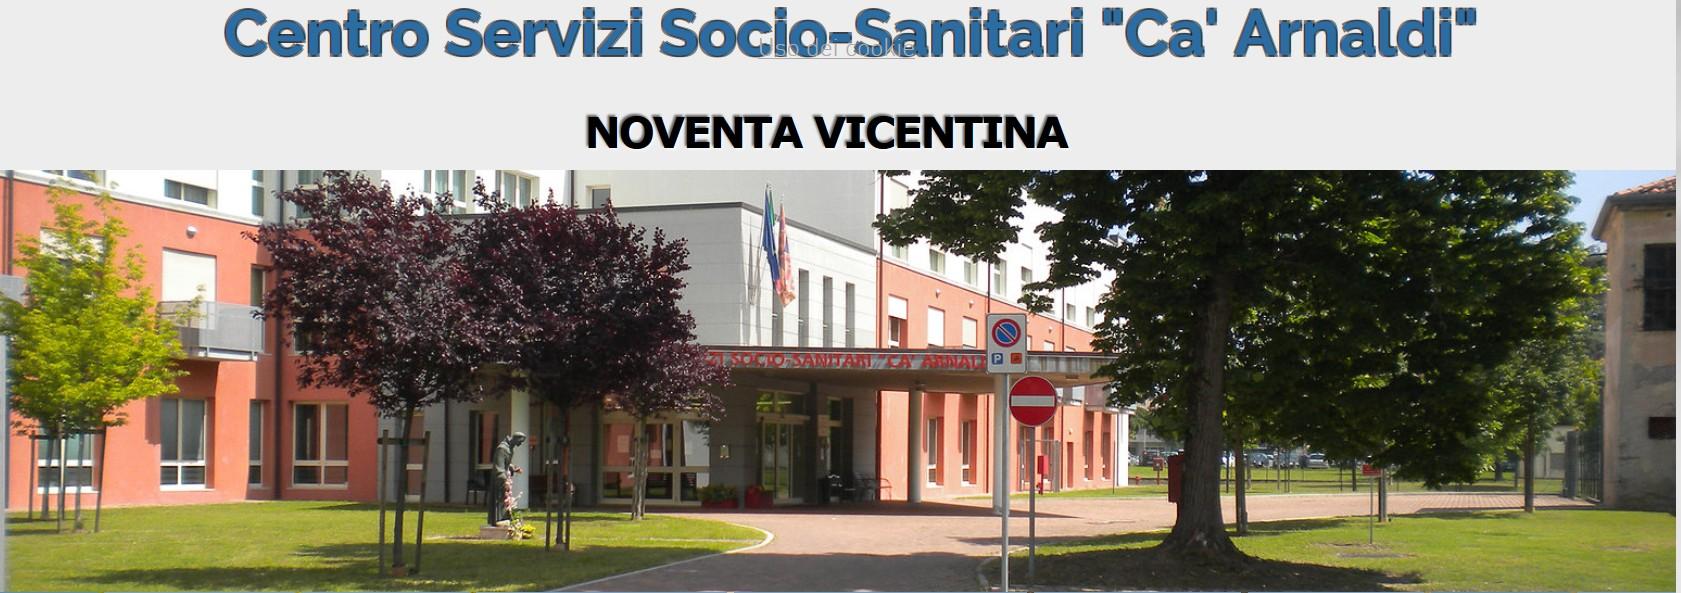 "Centro Servizi Socio Sanitari ""Ca' Arnaldi"" - IPAB | LinkedIn"